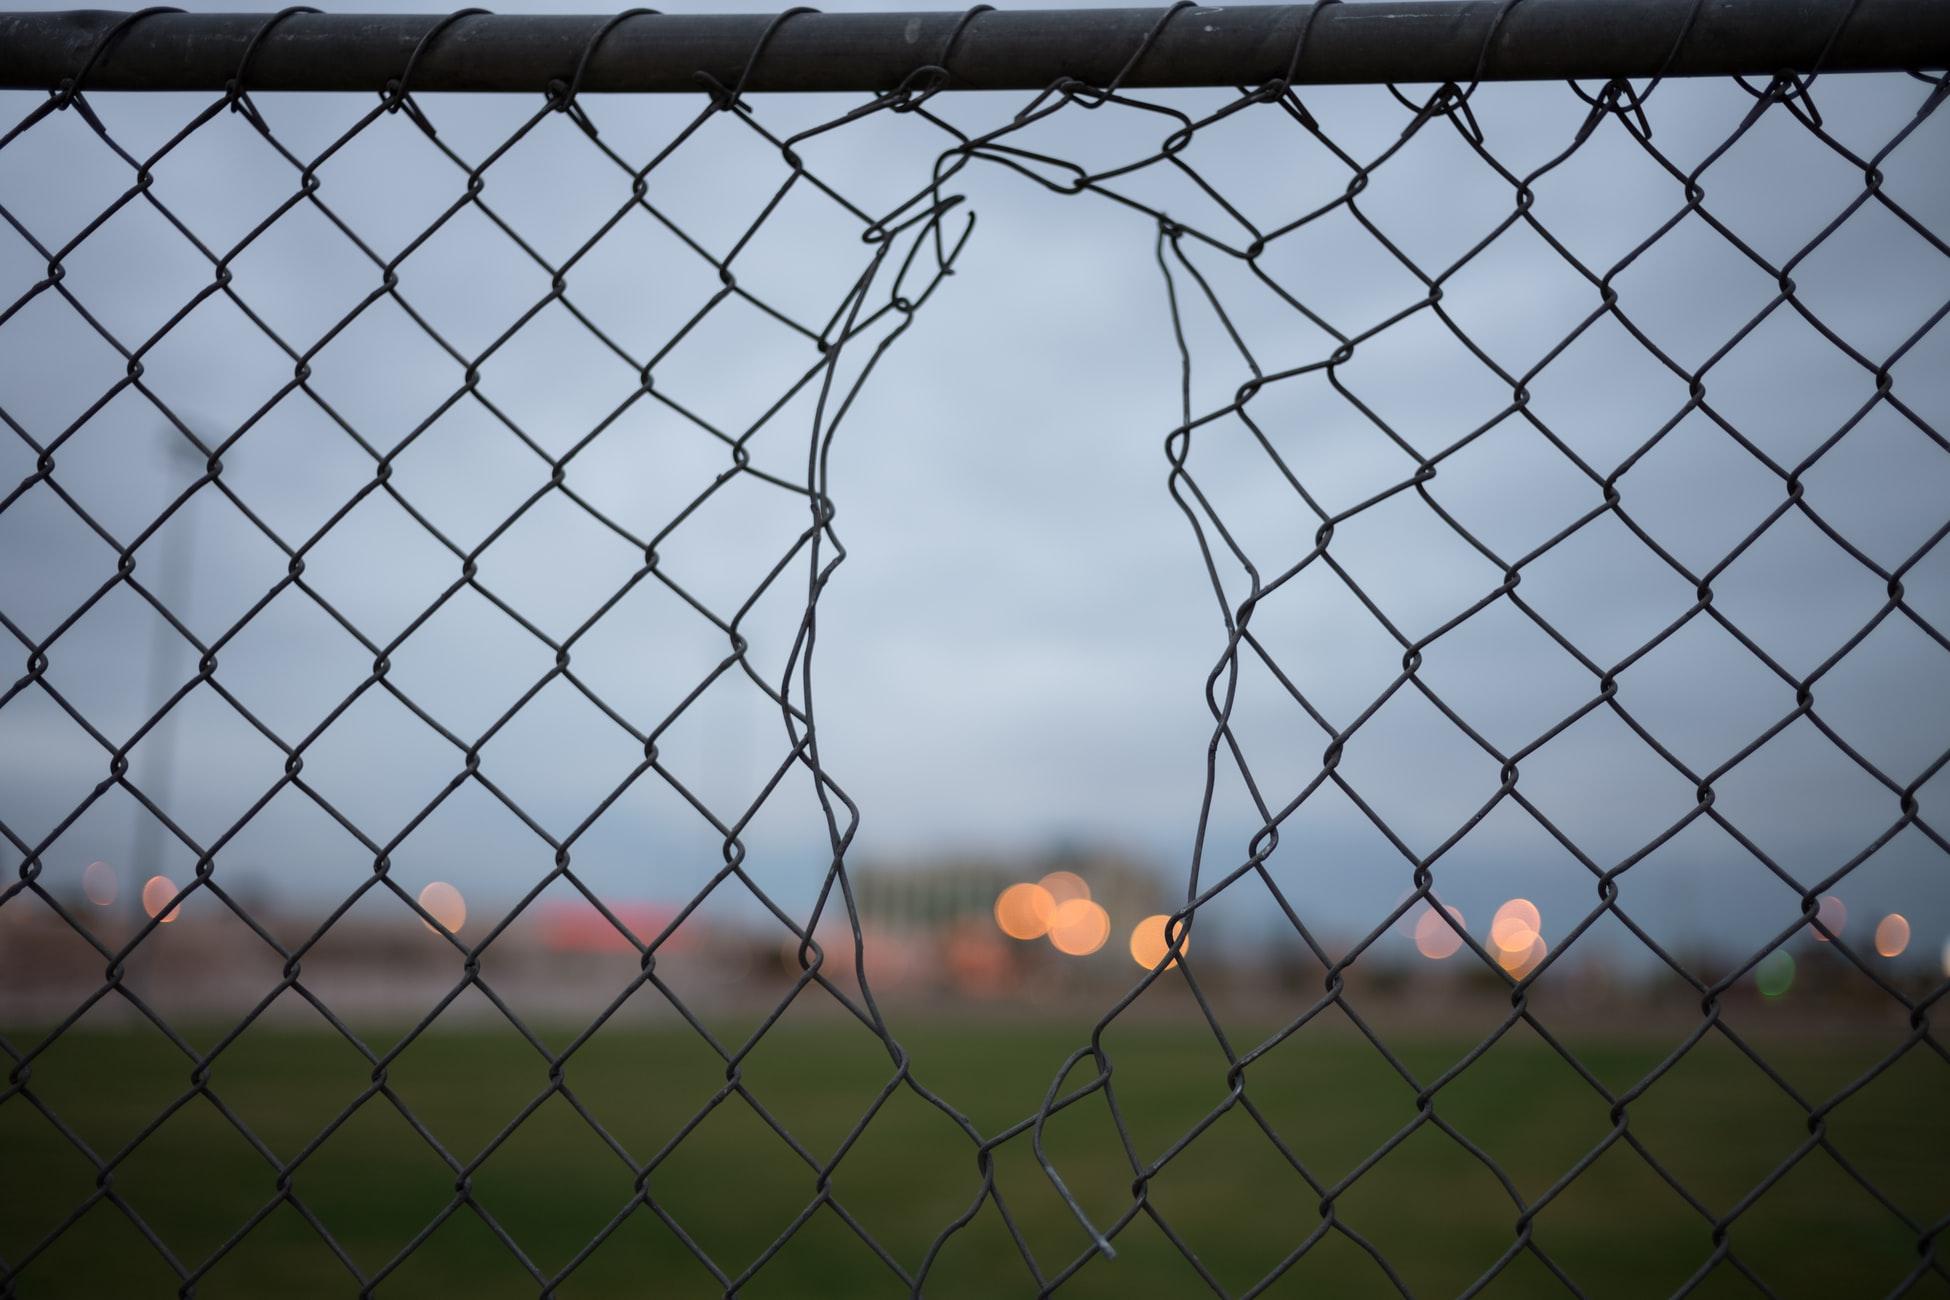 A broken chain link fence creates security vulnerabilities